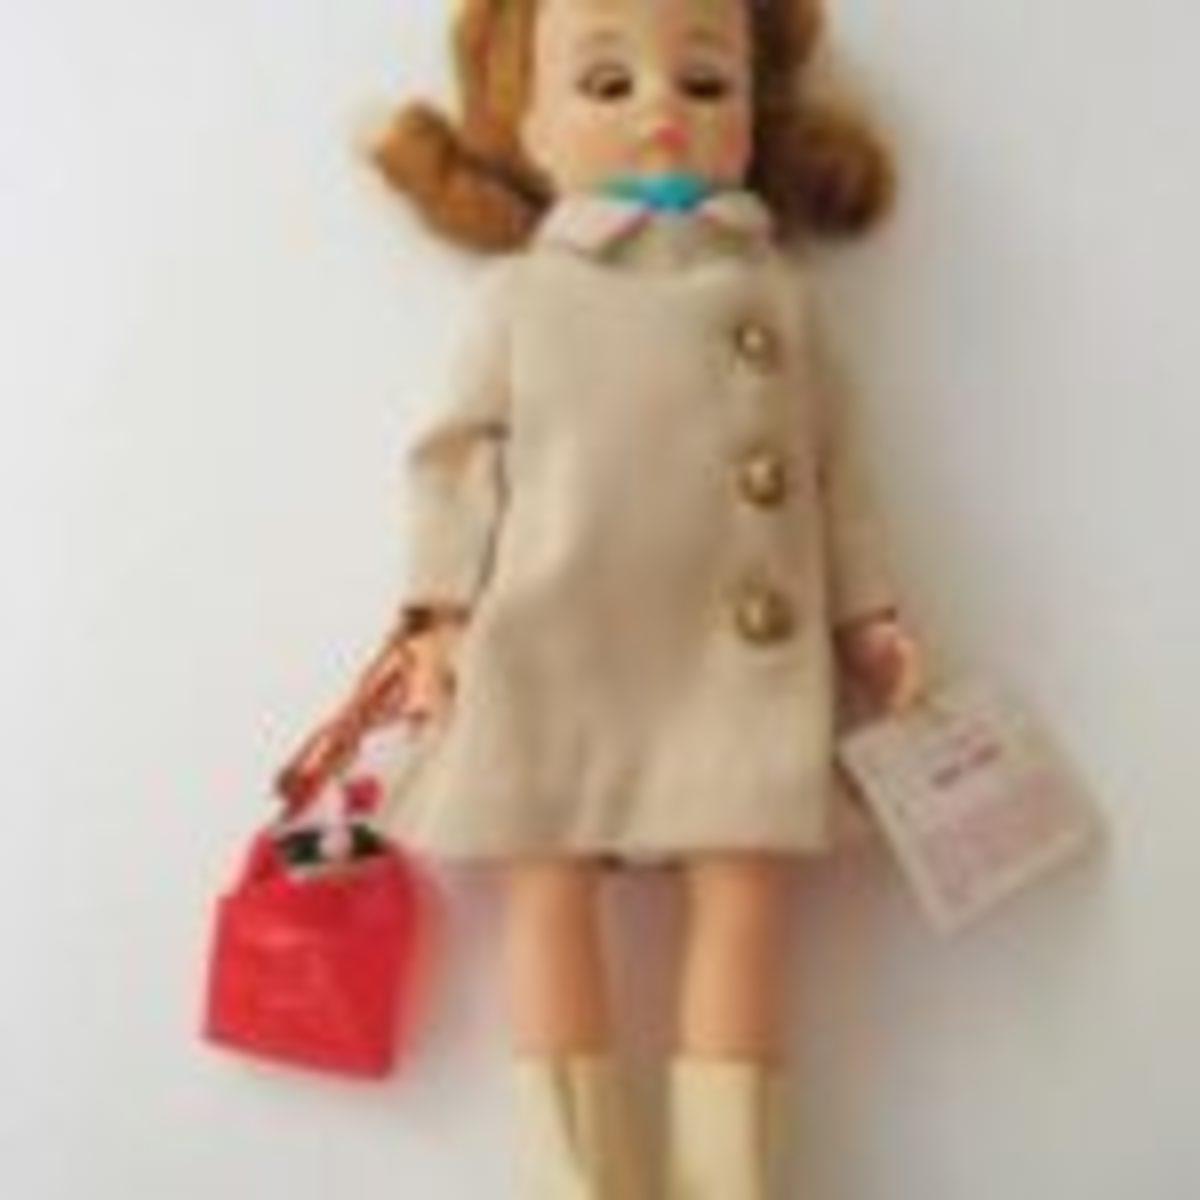 Nancy Drew Madame Alexander doll, 1967.